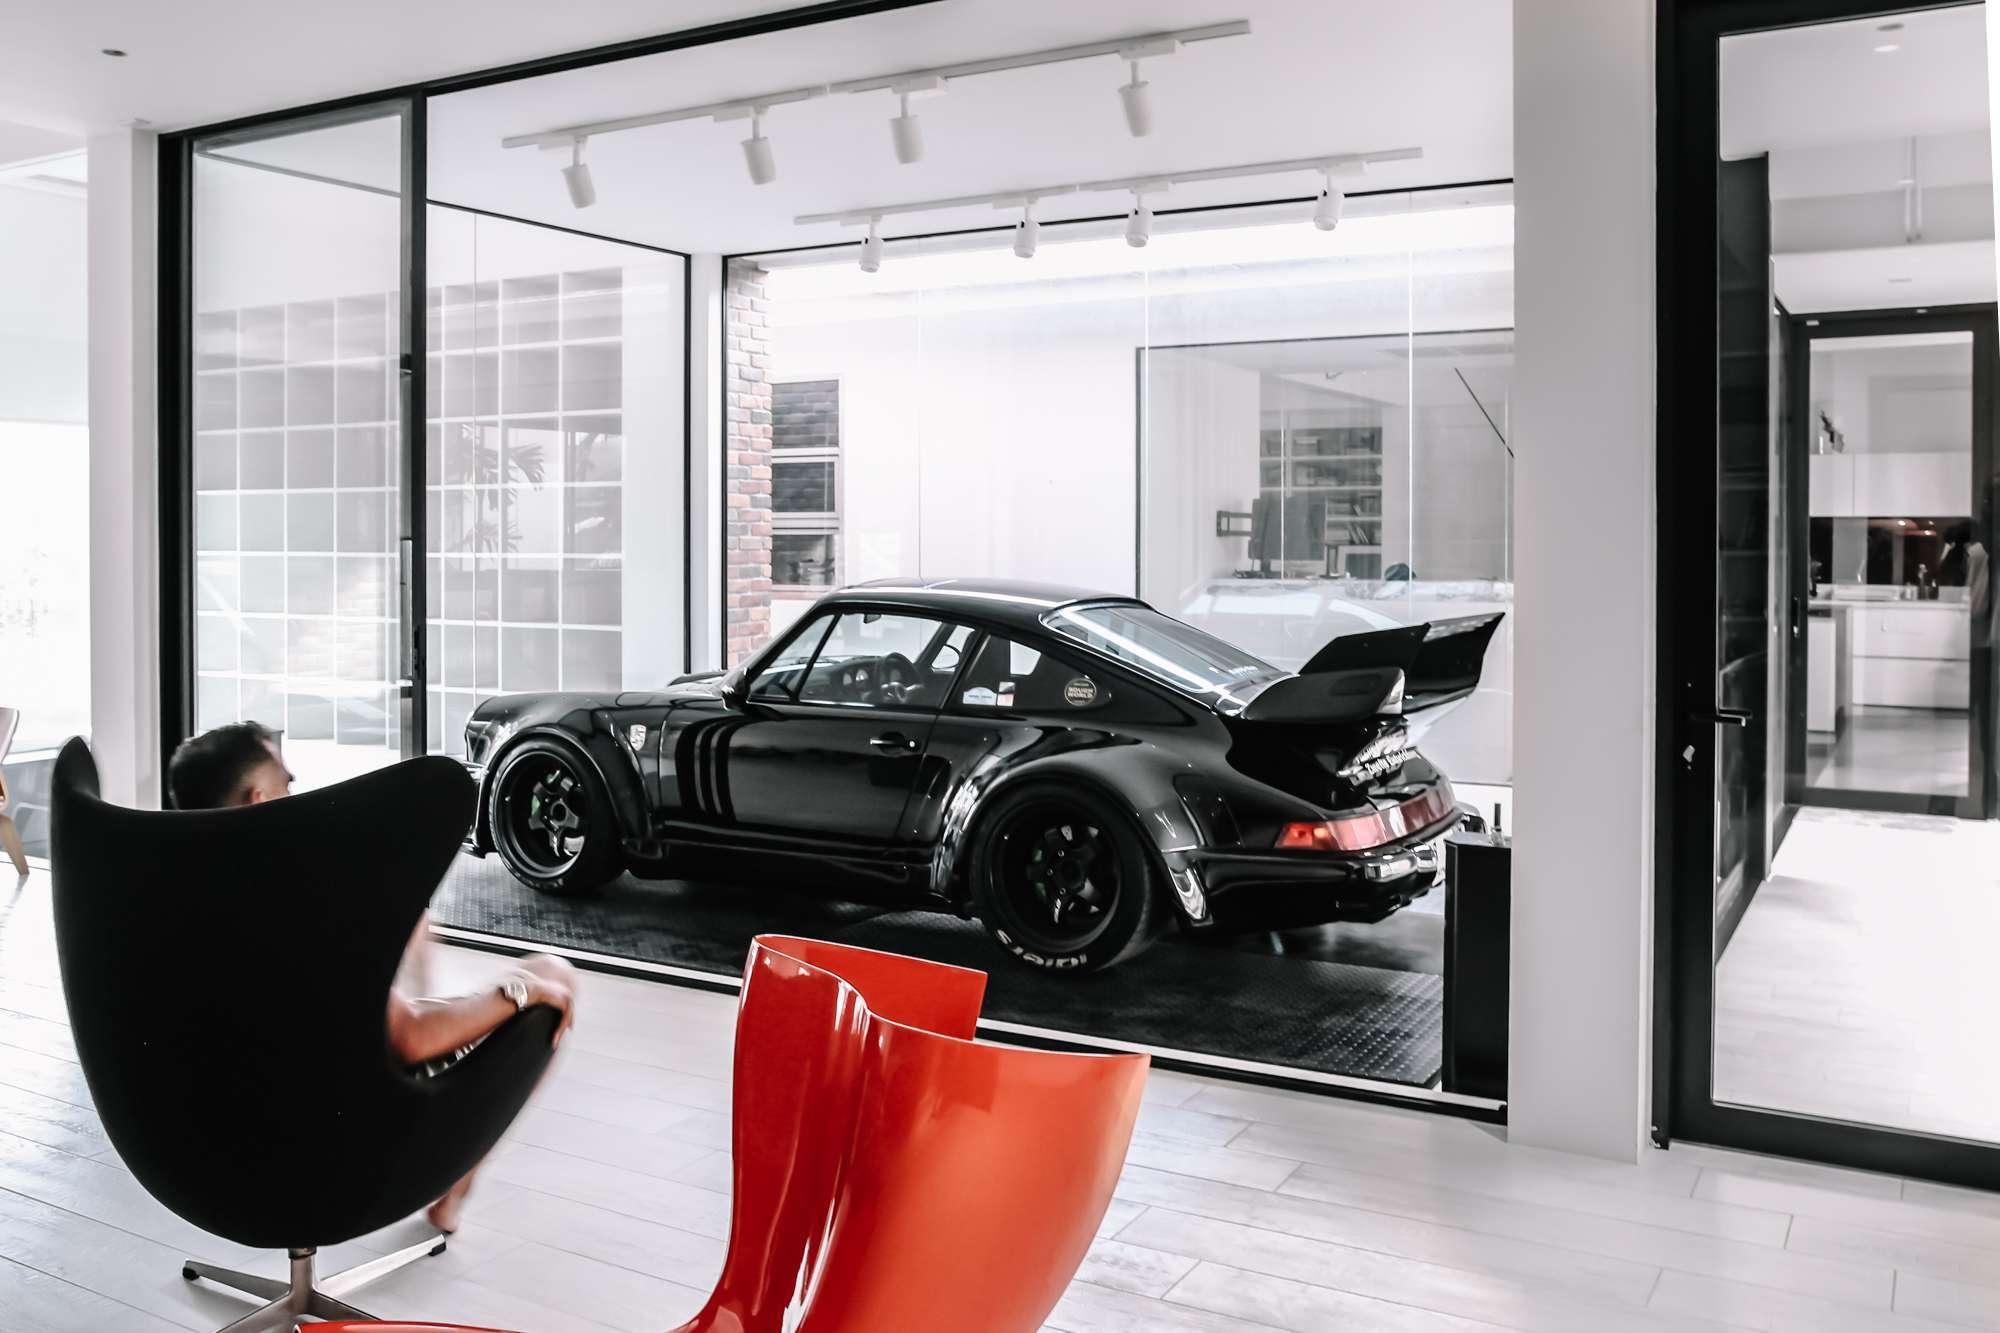 TeensterPorscheHouse47 Cozy Prix D'une Porsche 911 Gt1 Cars Trend